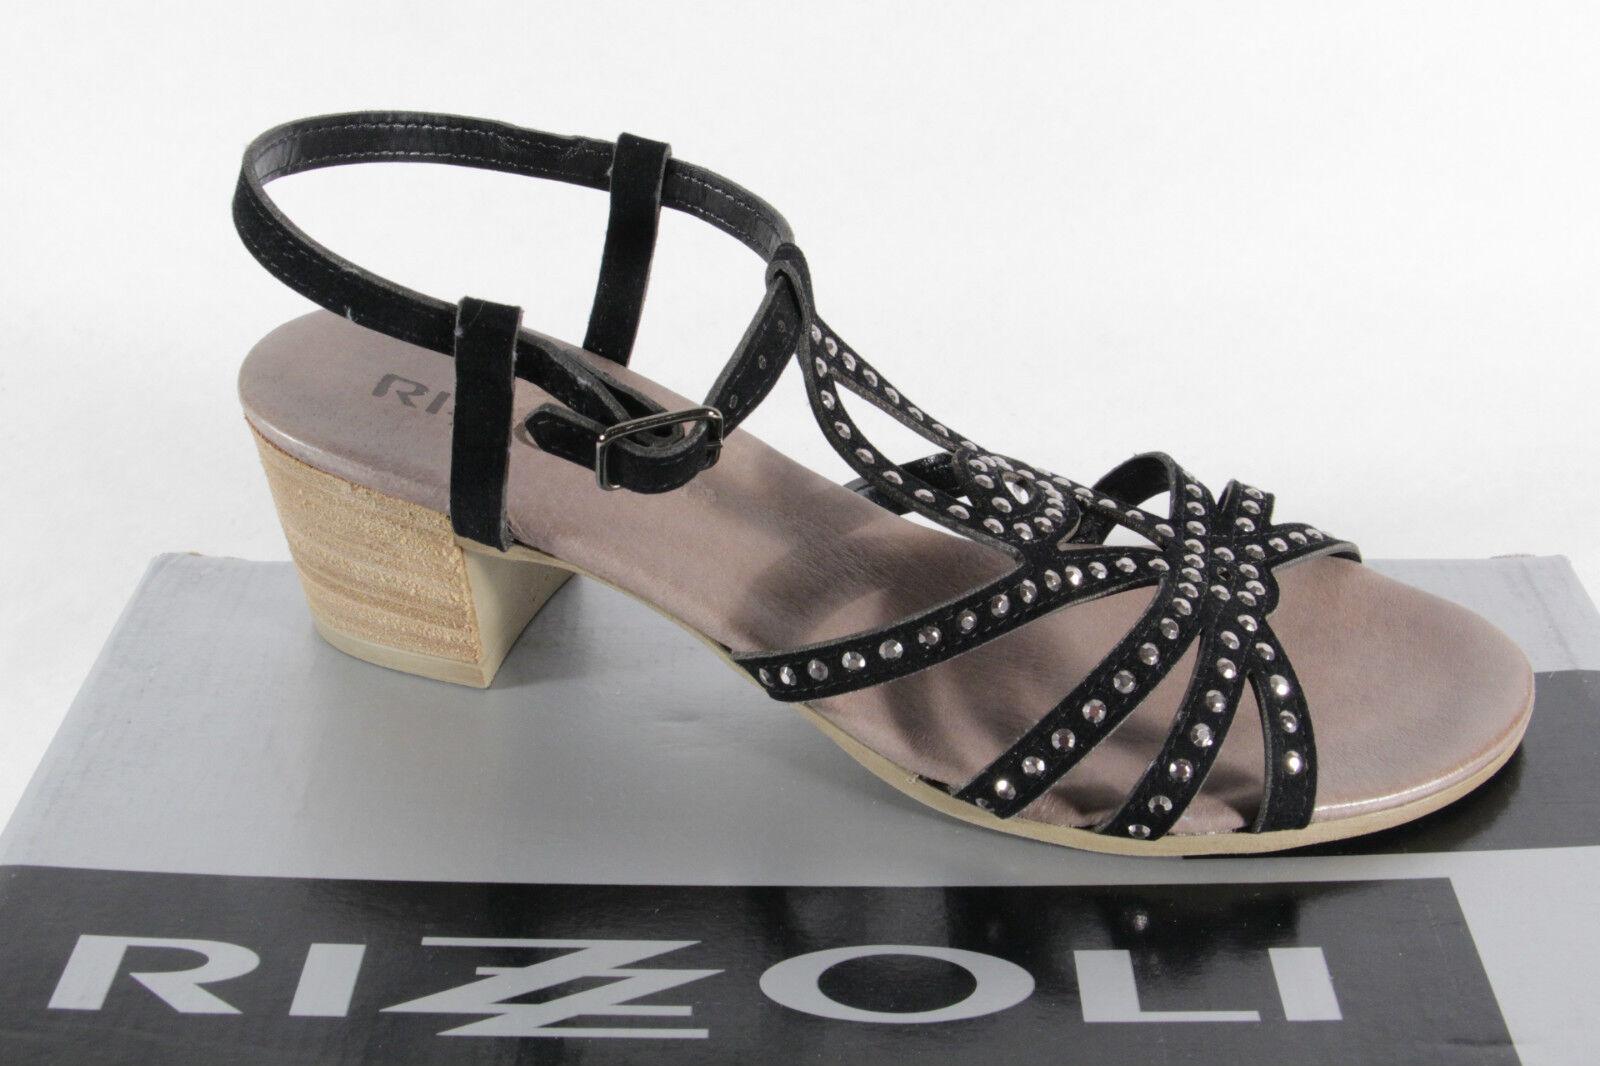 Rizzoli Damen Sandale schwarz, weiche Lederinnensohle, schmale Form NEU